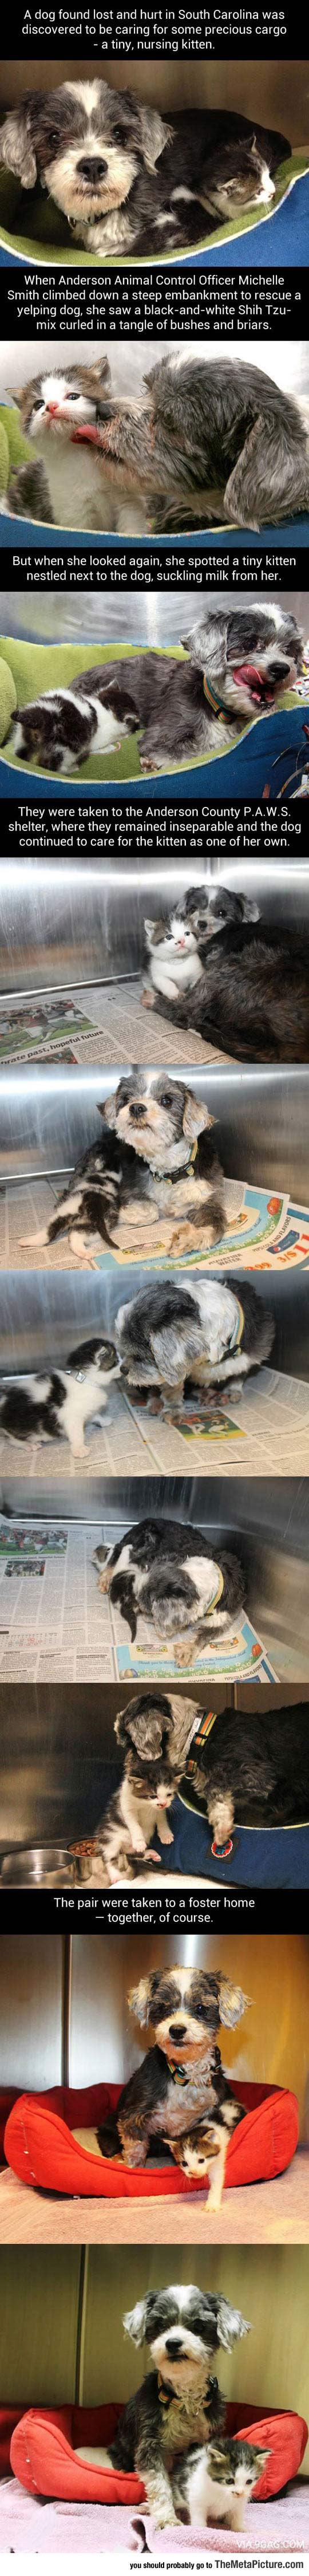 cool-dog-nursing-kitty-shelter